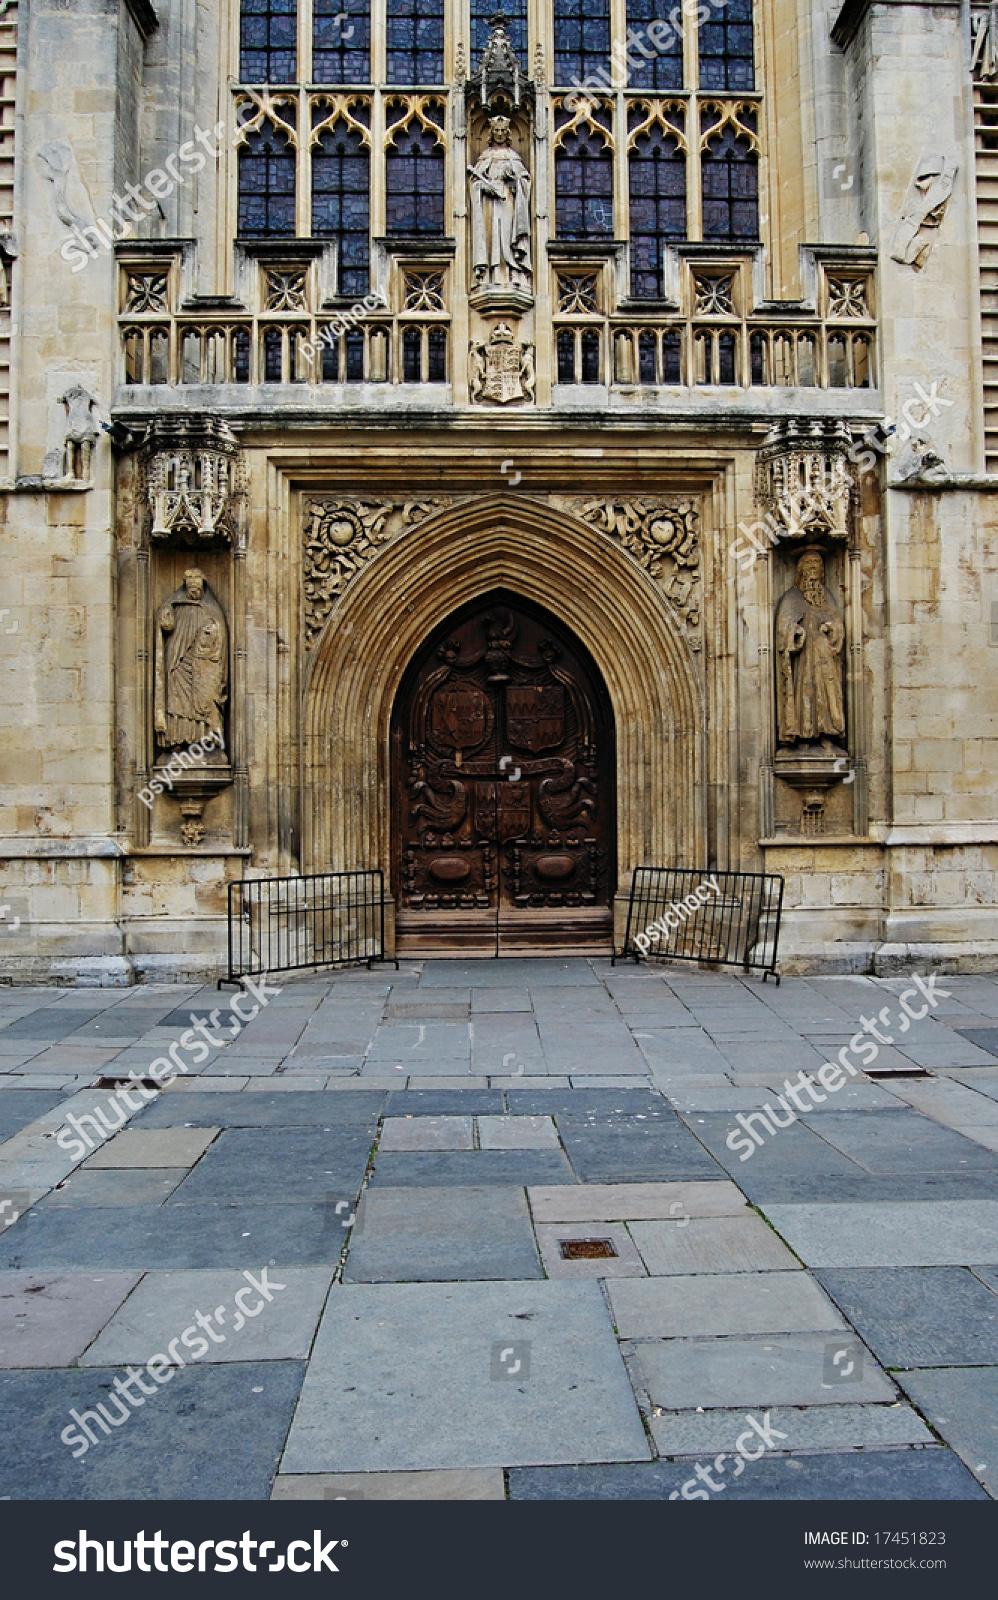 bath abbey doors & Bath Abbey Doors Stock Photo 17451823 - Shutterstock